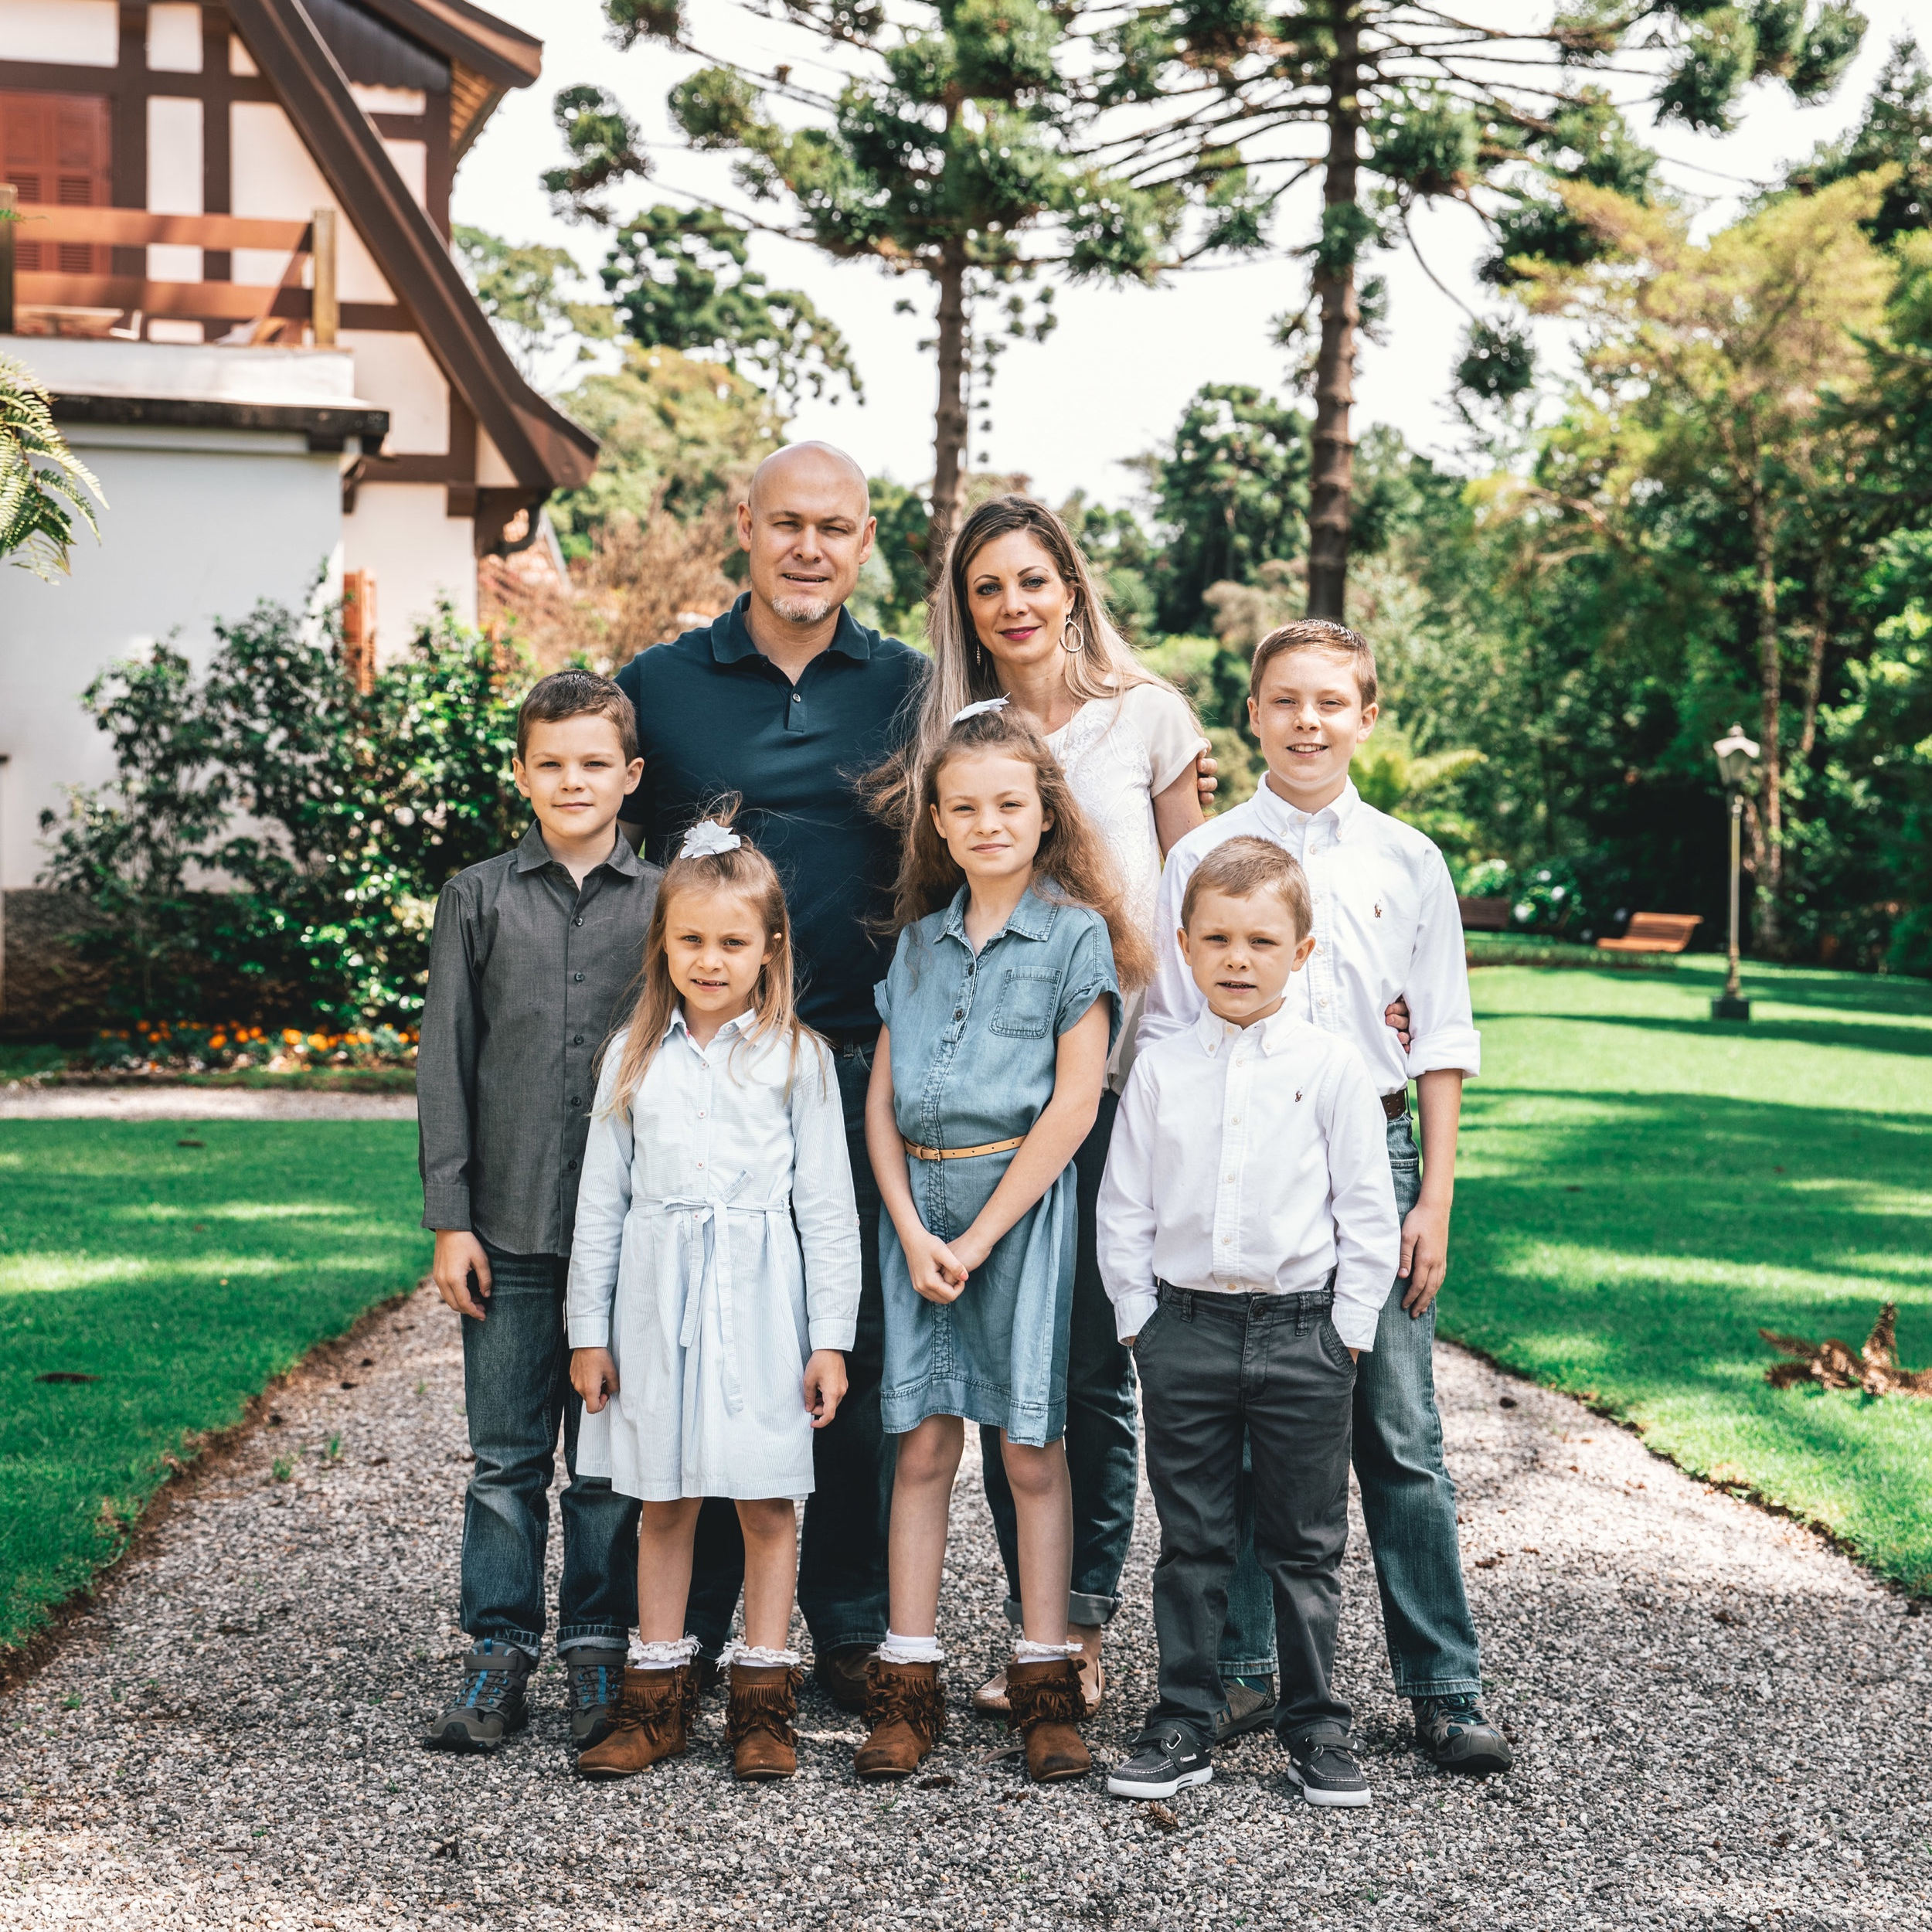 Jonathan and Erin - Samuel, Jesse, Abigail, Hannah, and Benjamin